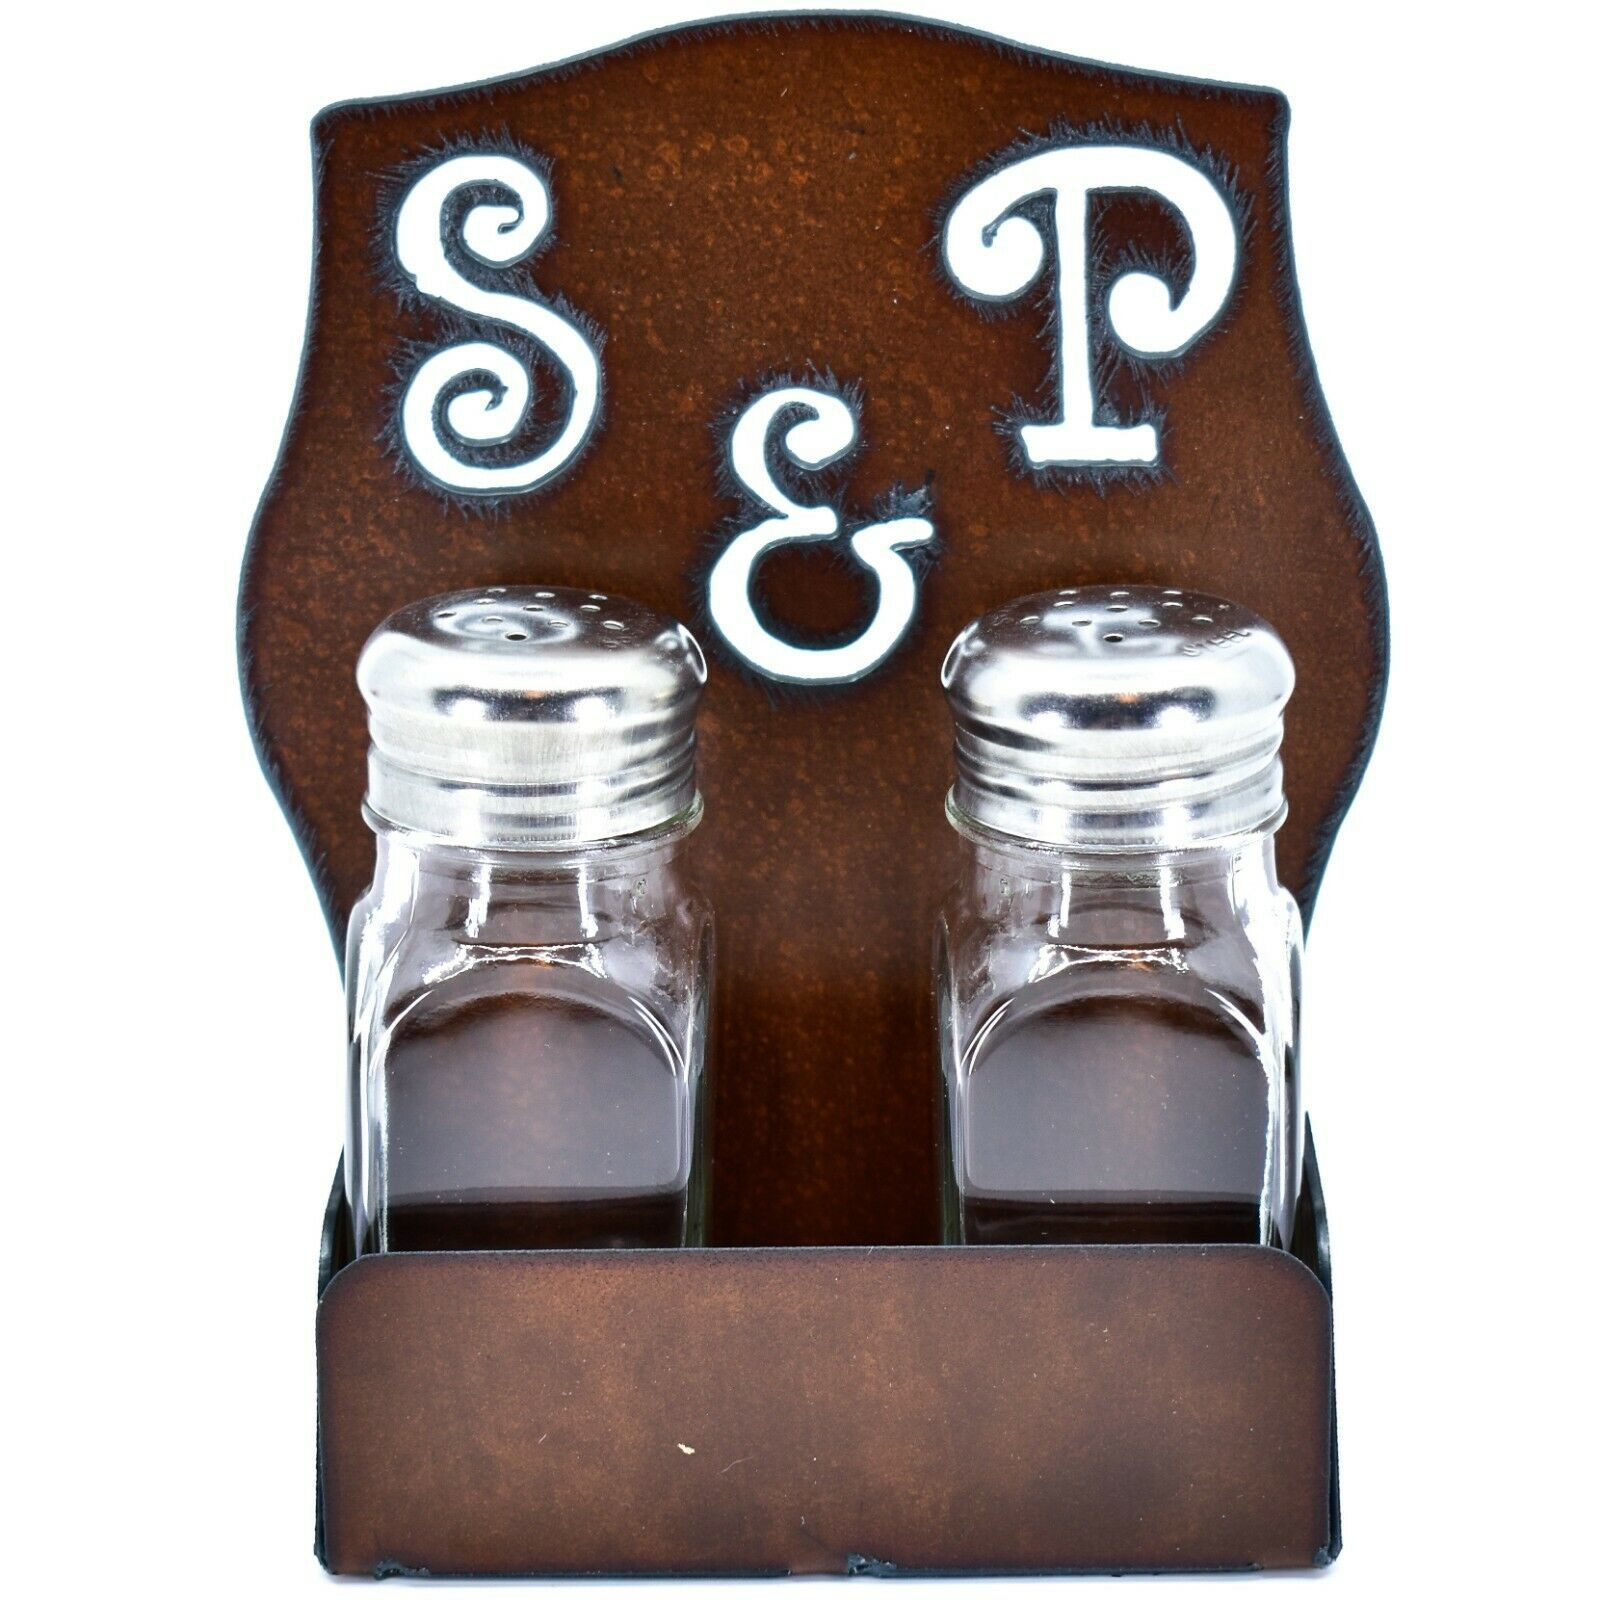 Rustic Iron Metal Cutout S&P Script Salt & Pepper Shaker Set